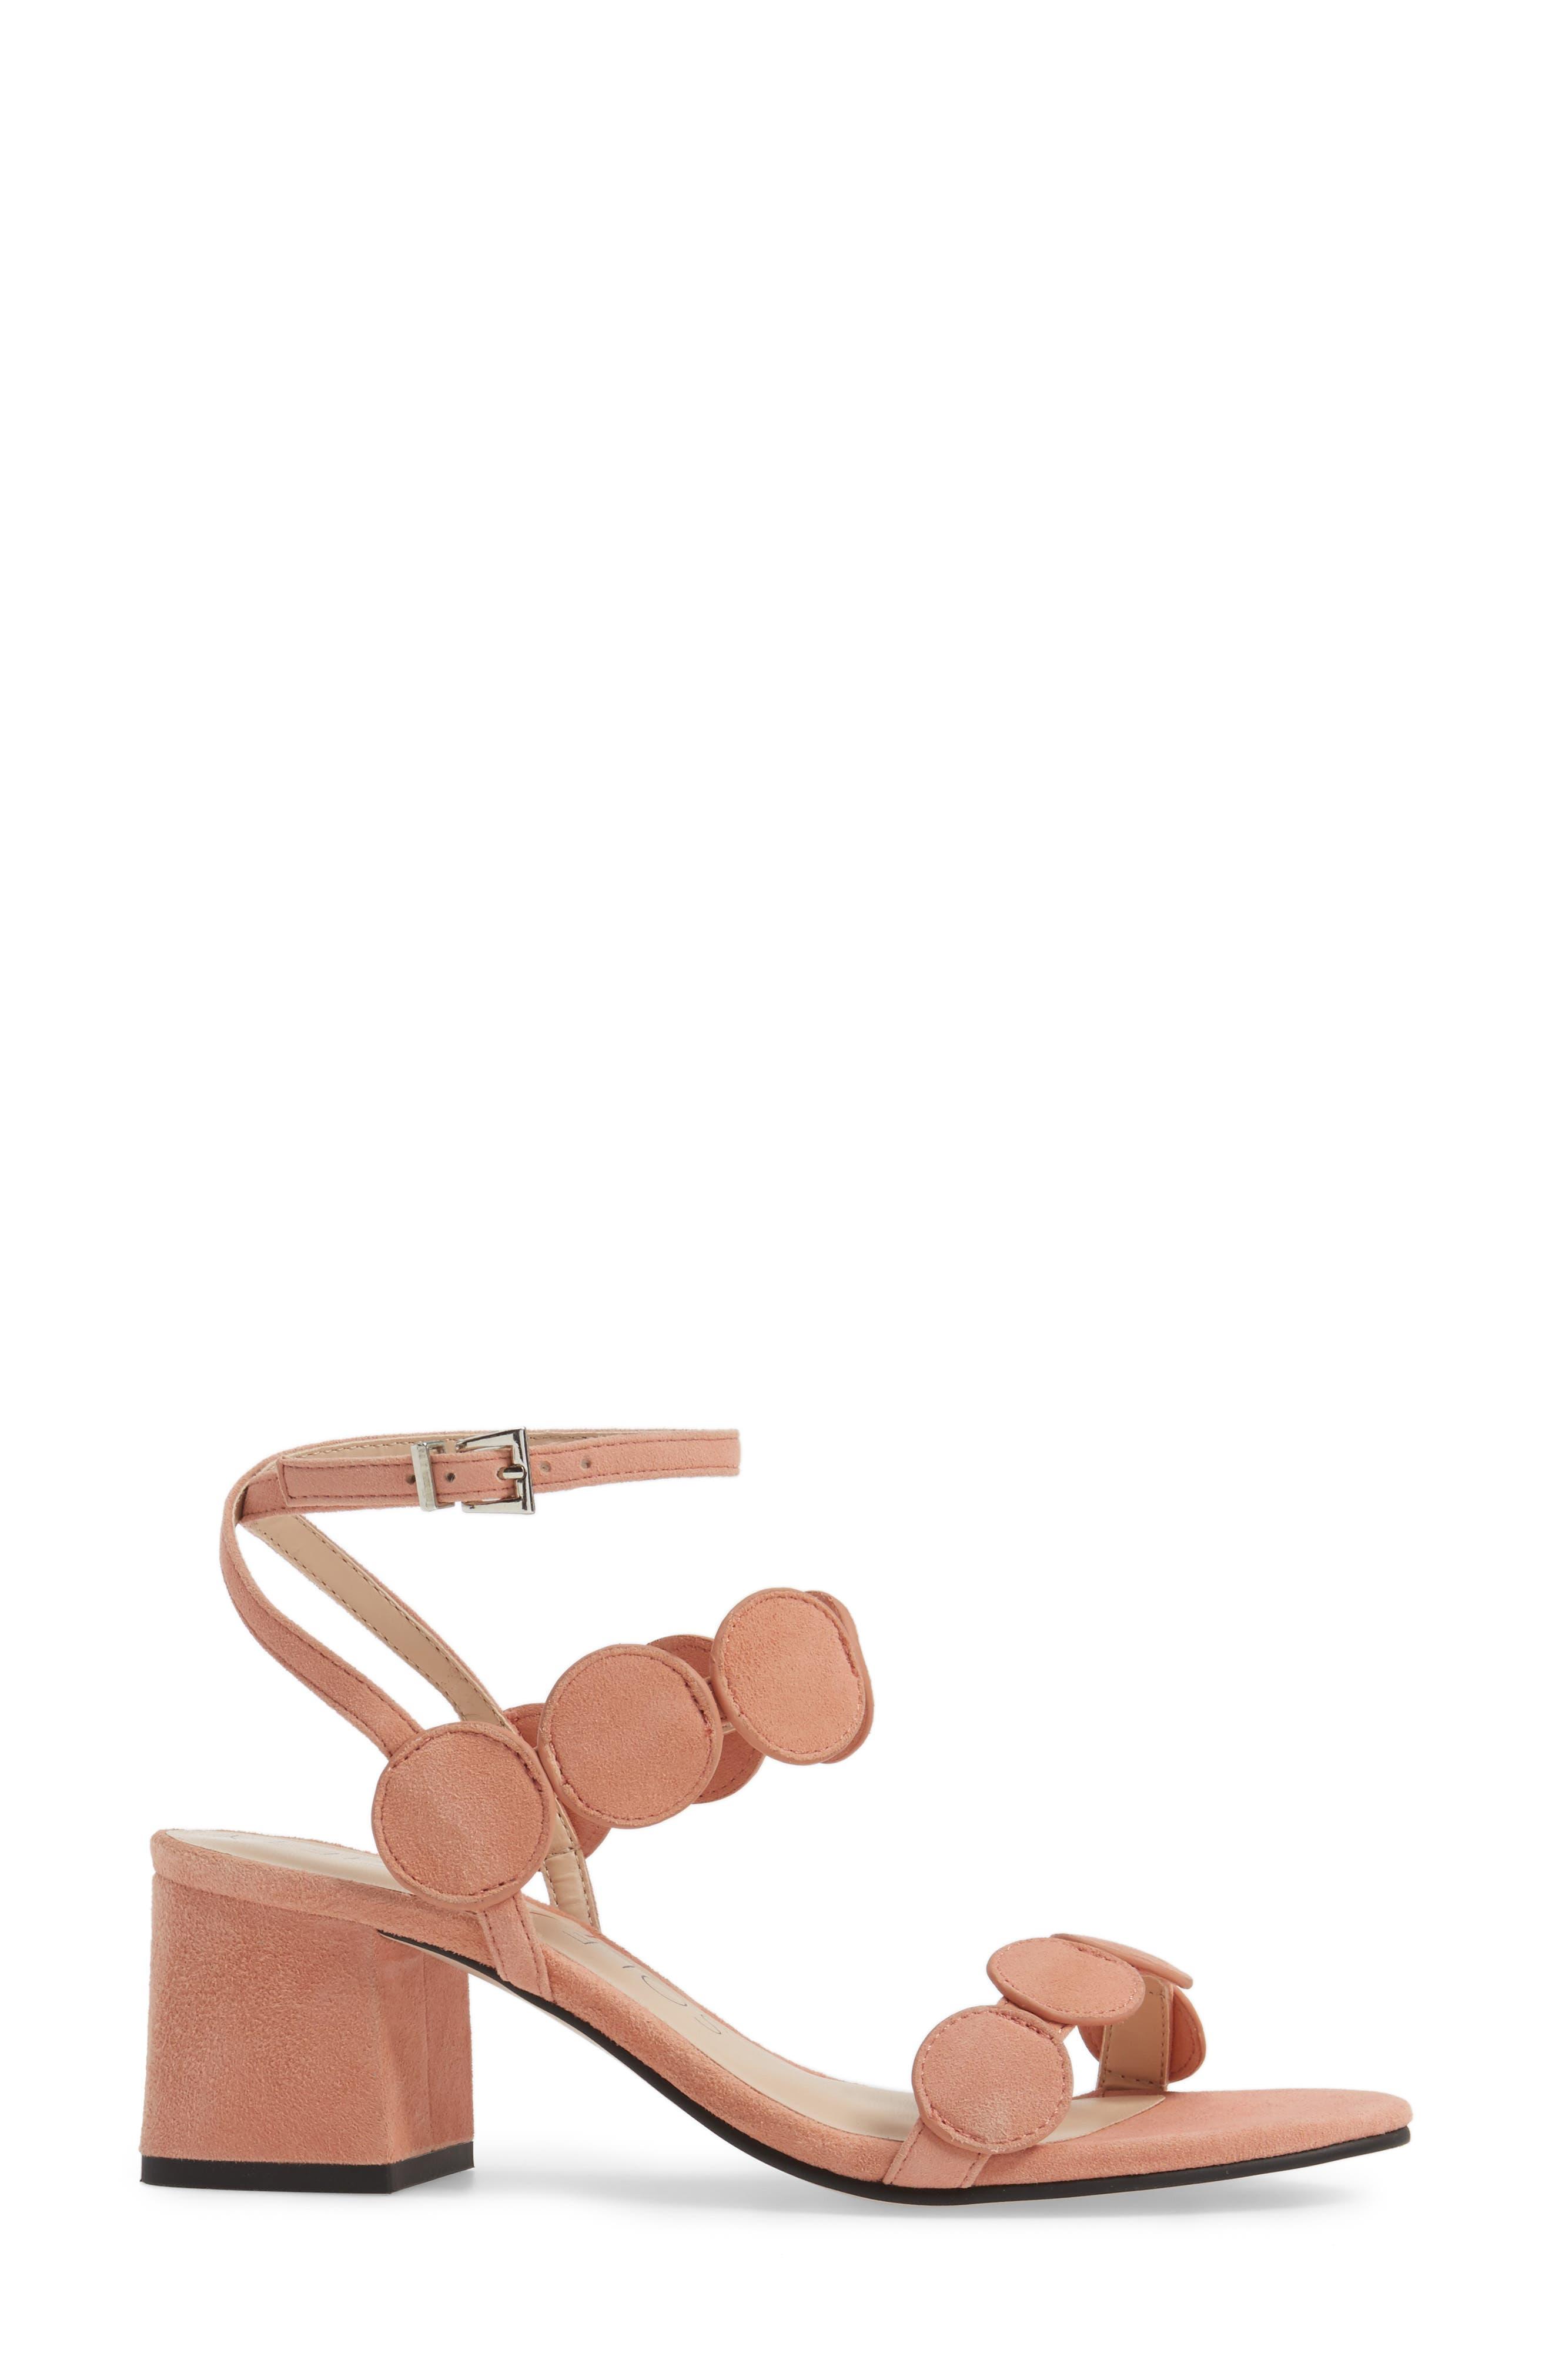 Shea Block Heel Sandal,                             Alternate thumbnail 20, color,